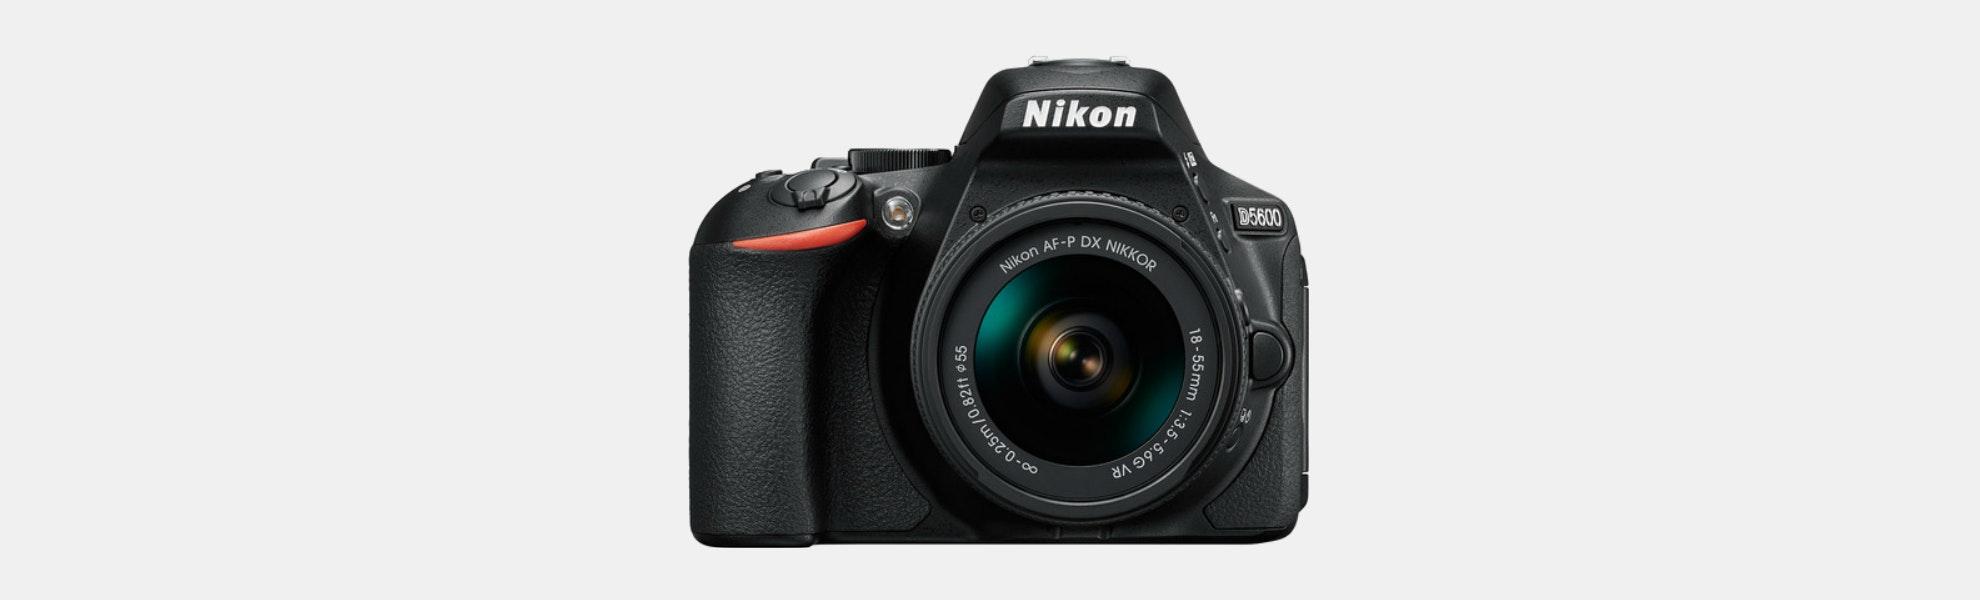 Nikon D5600 w/ 18-55mm and 70-300mm (Refurbished)